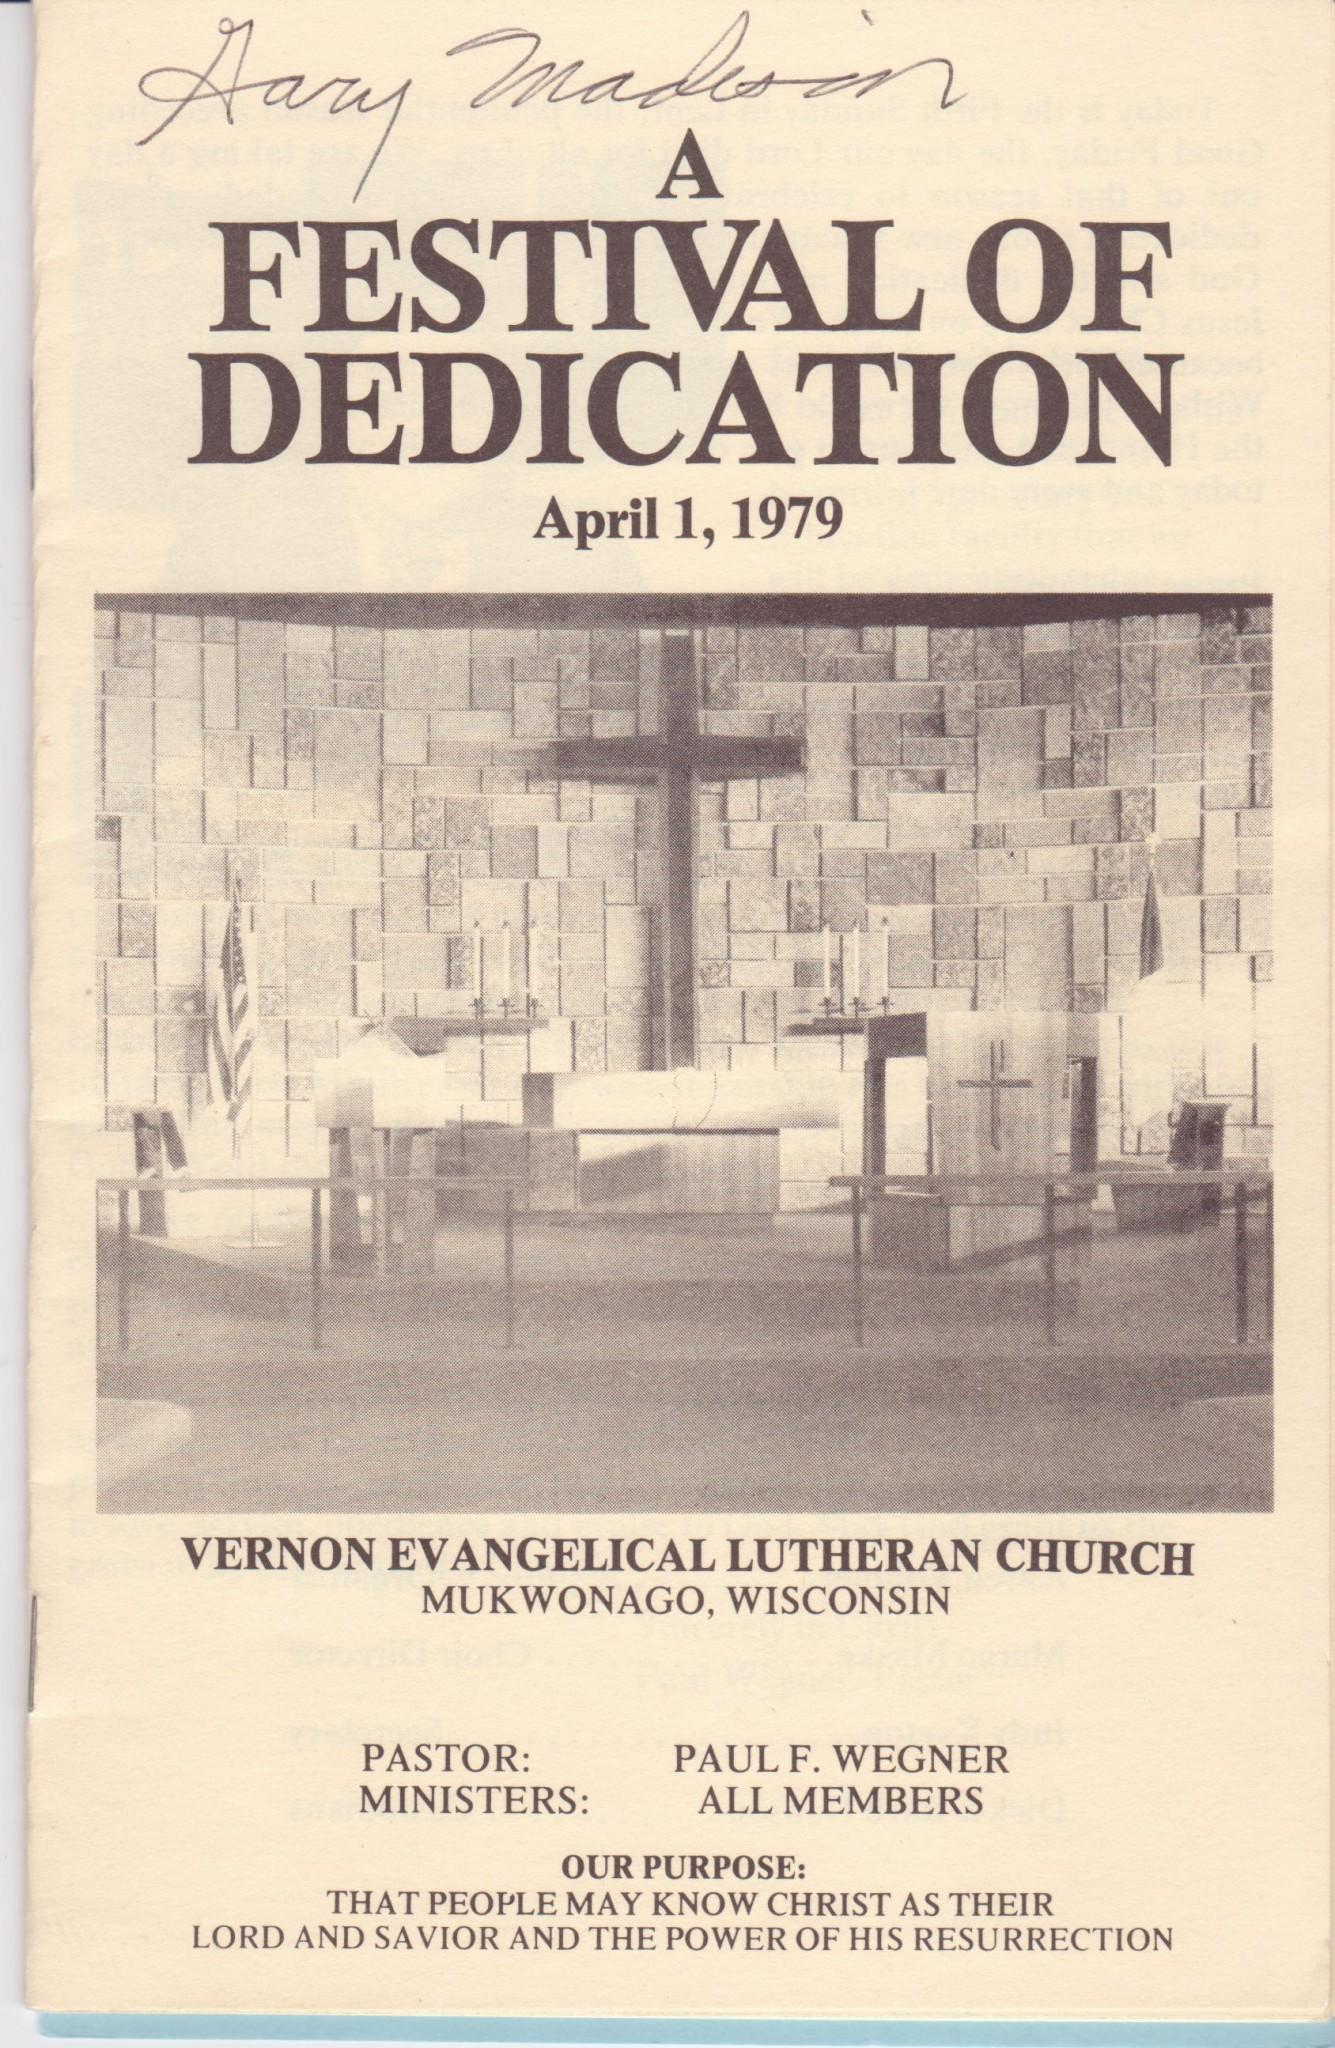 Festival of Dedication April 1, 1979 001 – Vernon Evangelical